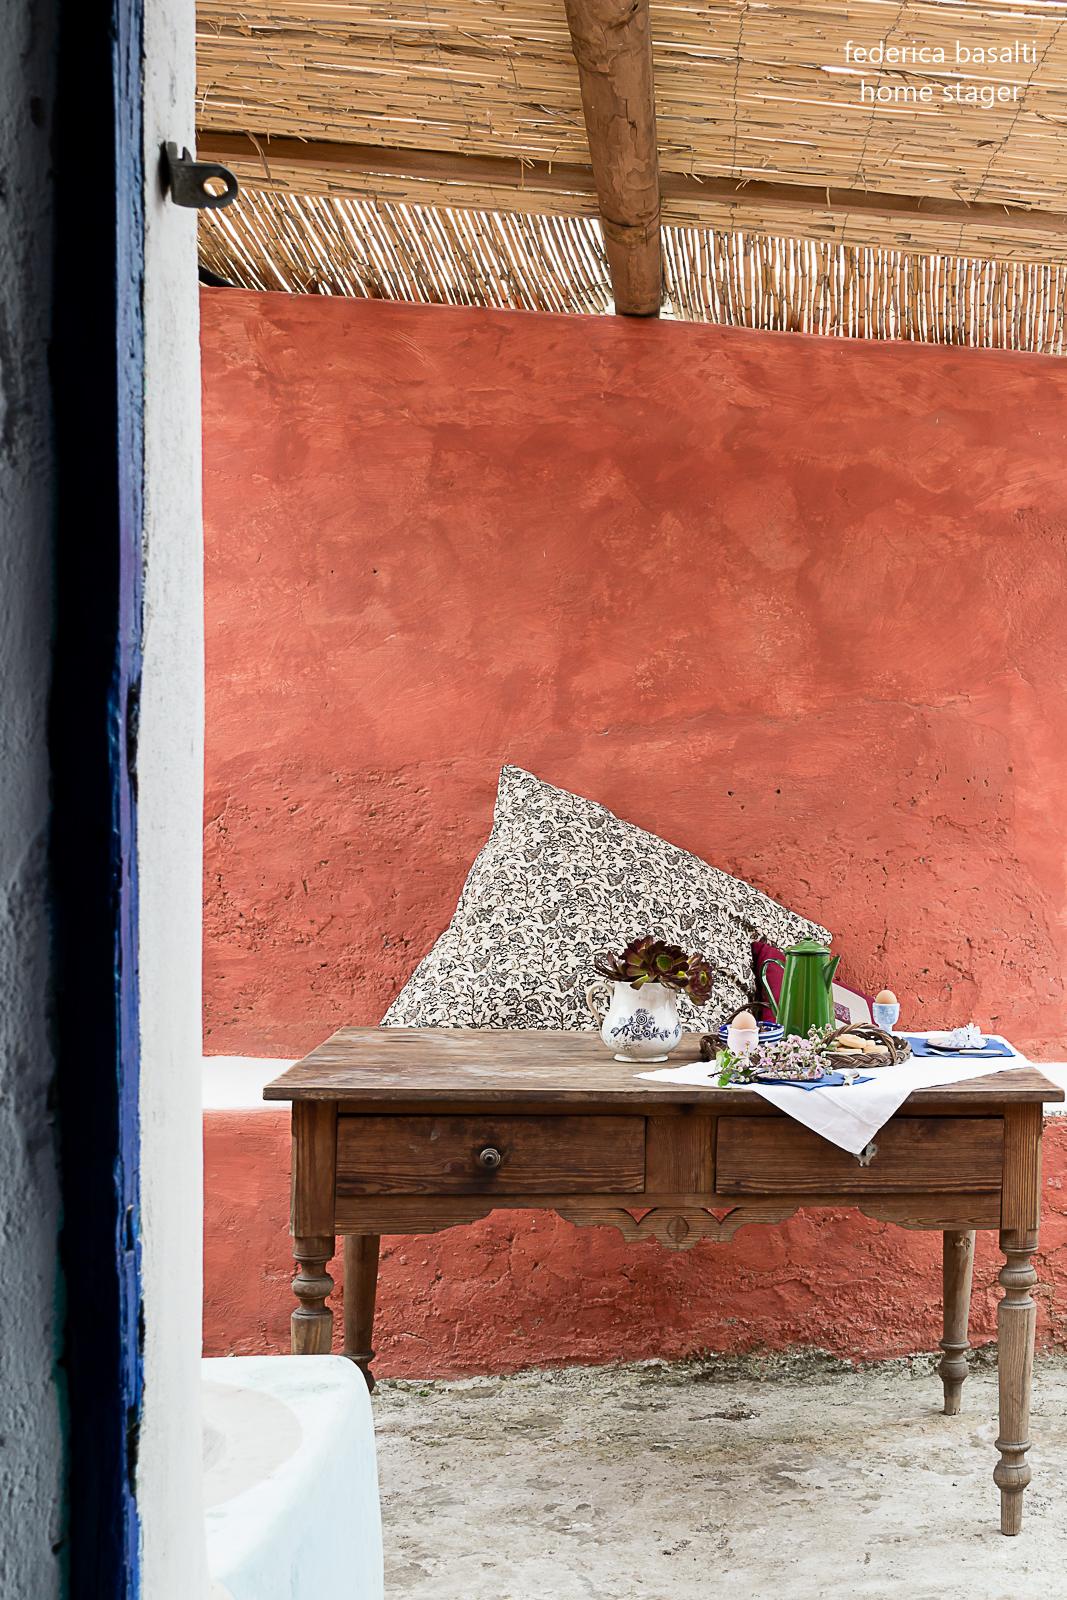 come affittare case vacanza - Home Staging - Federica Basalti